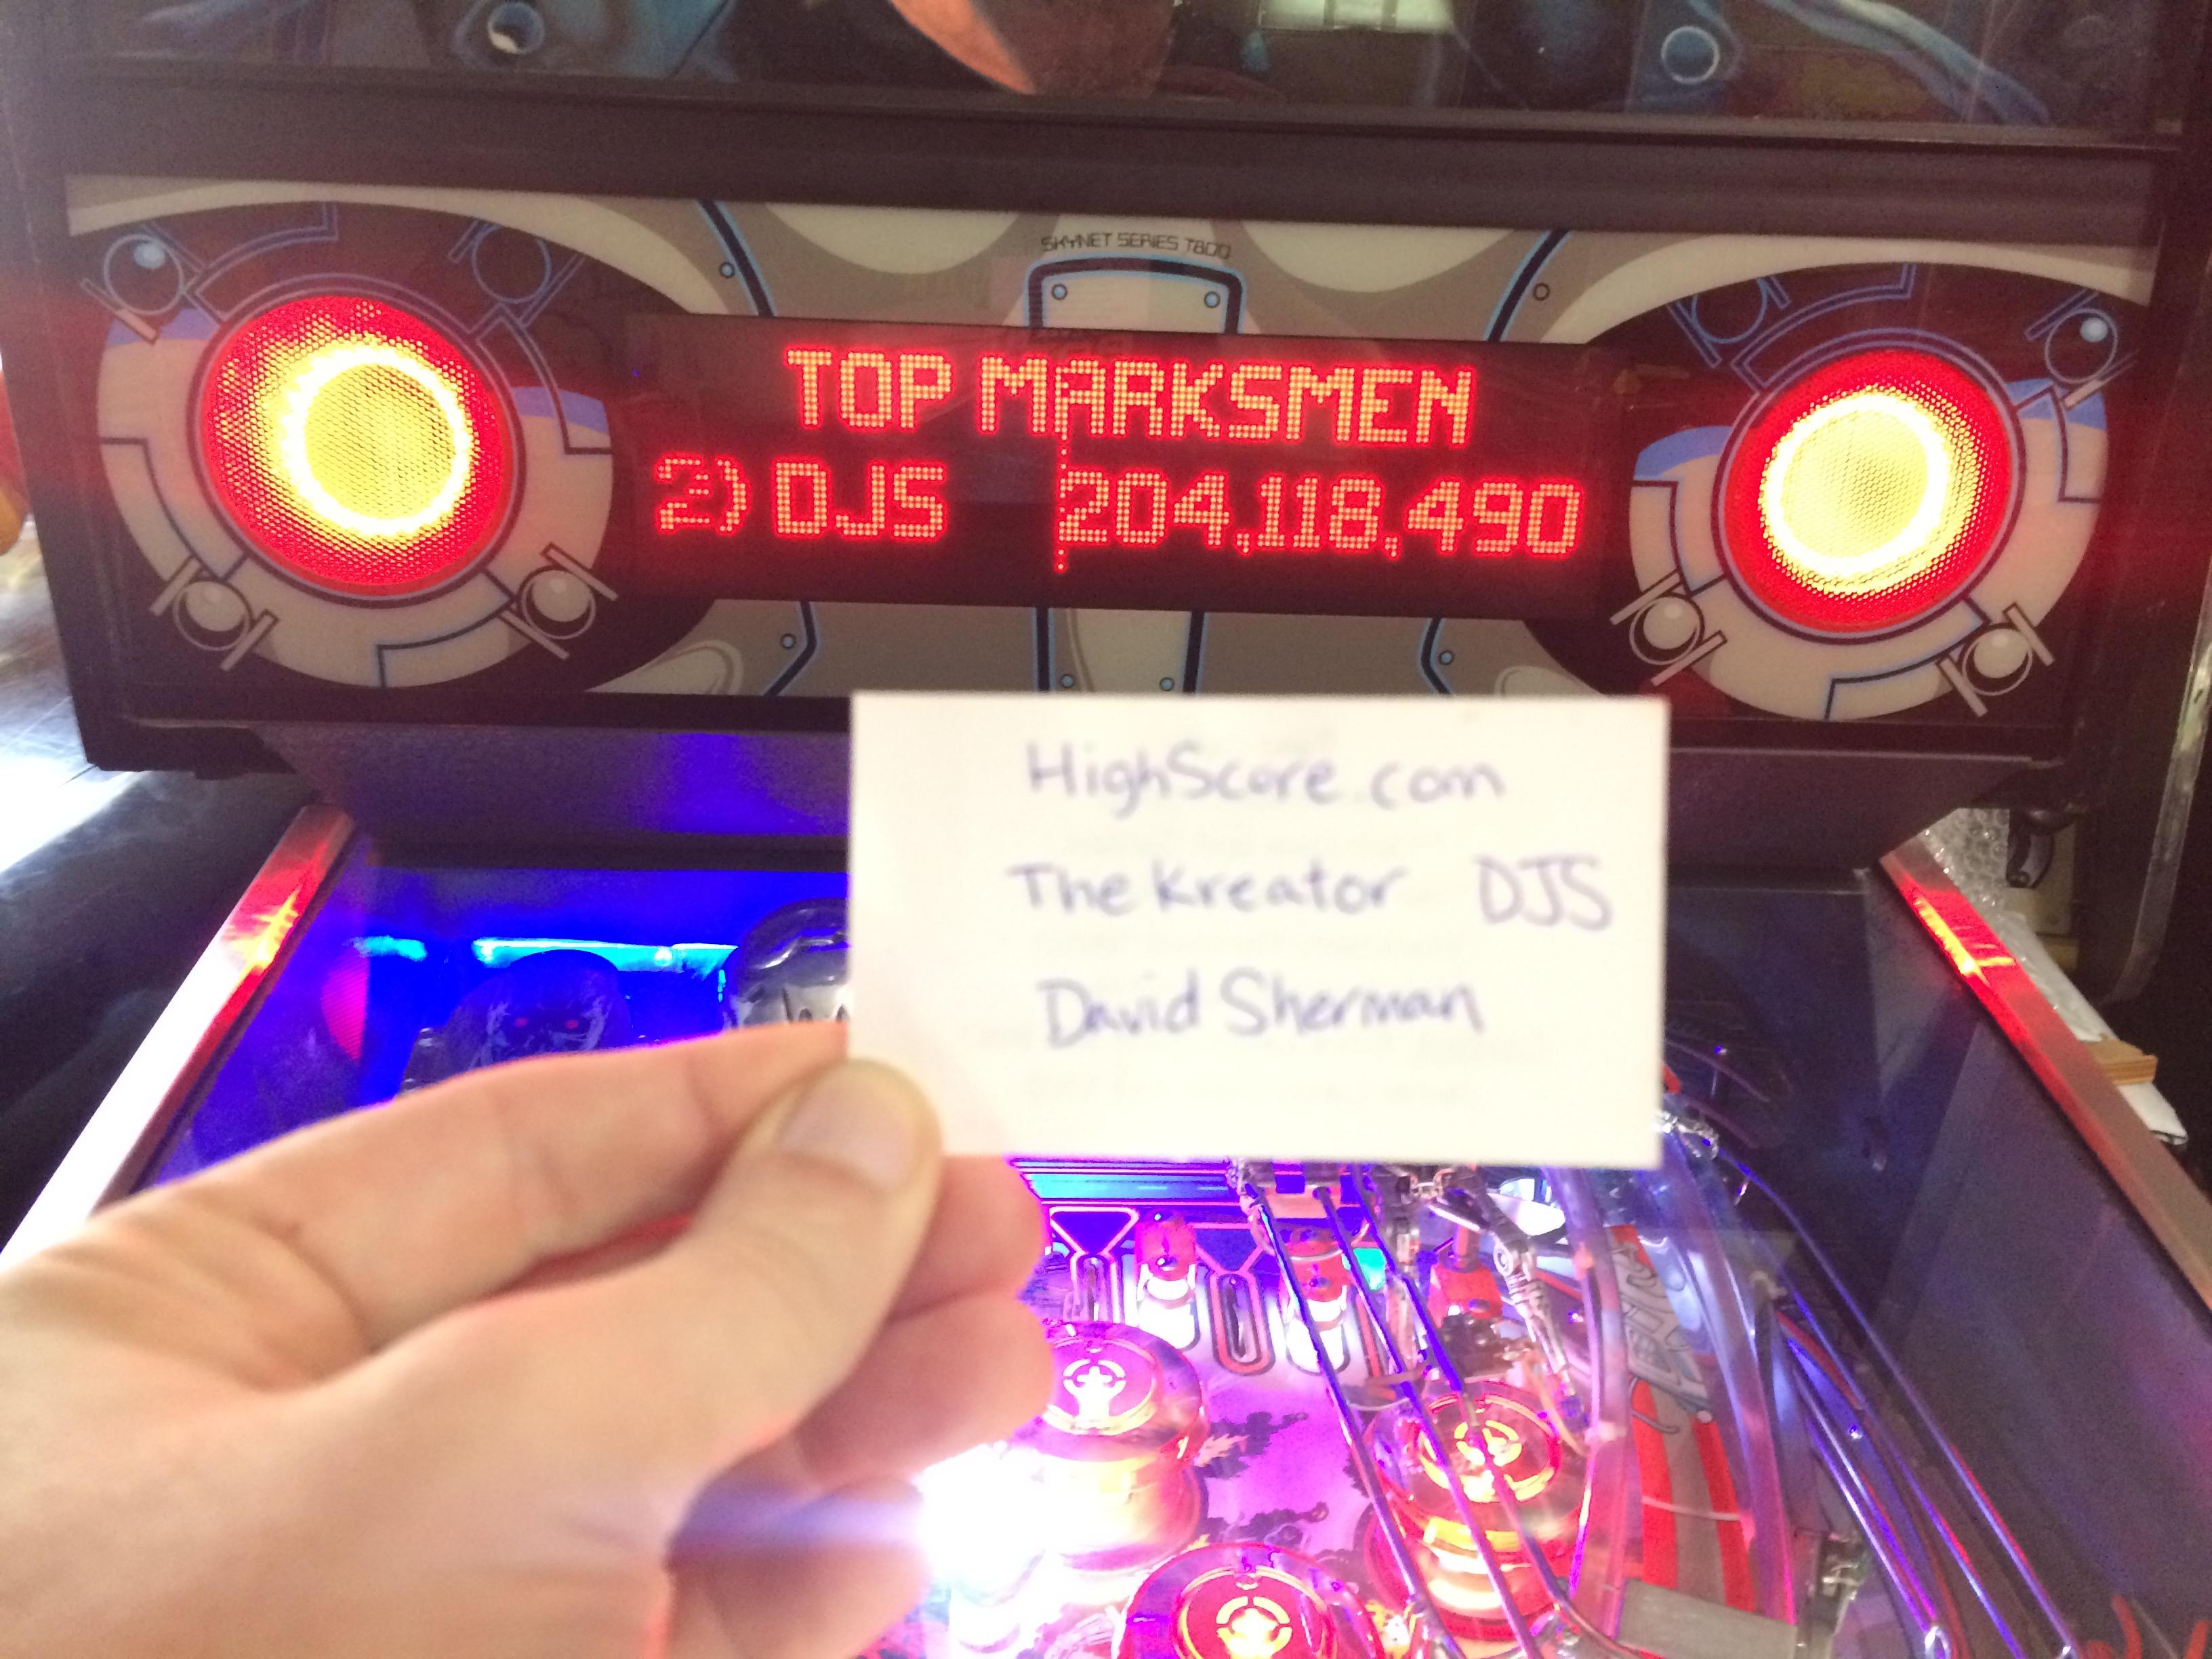 thekreator: Terminator 2: Judgement Day (Pinball: 3 Balls) 214,423,150 points on 2017-06-05 18:28:14